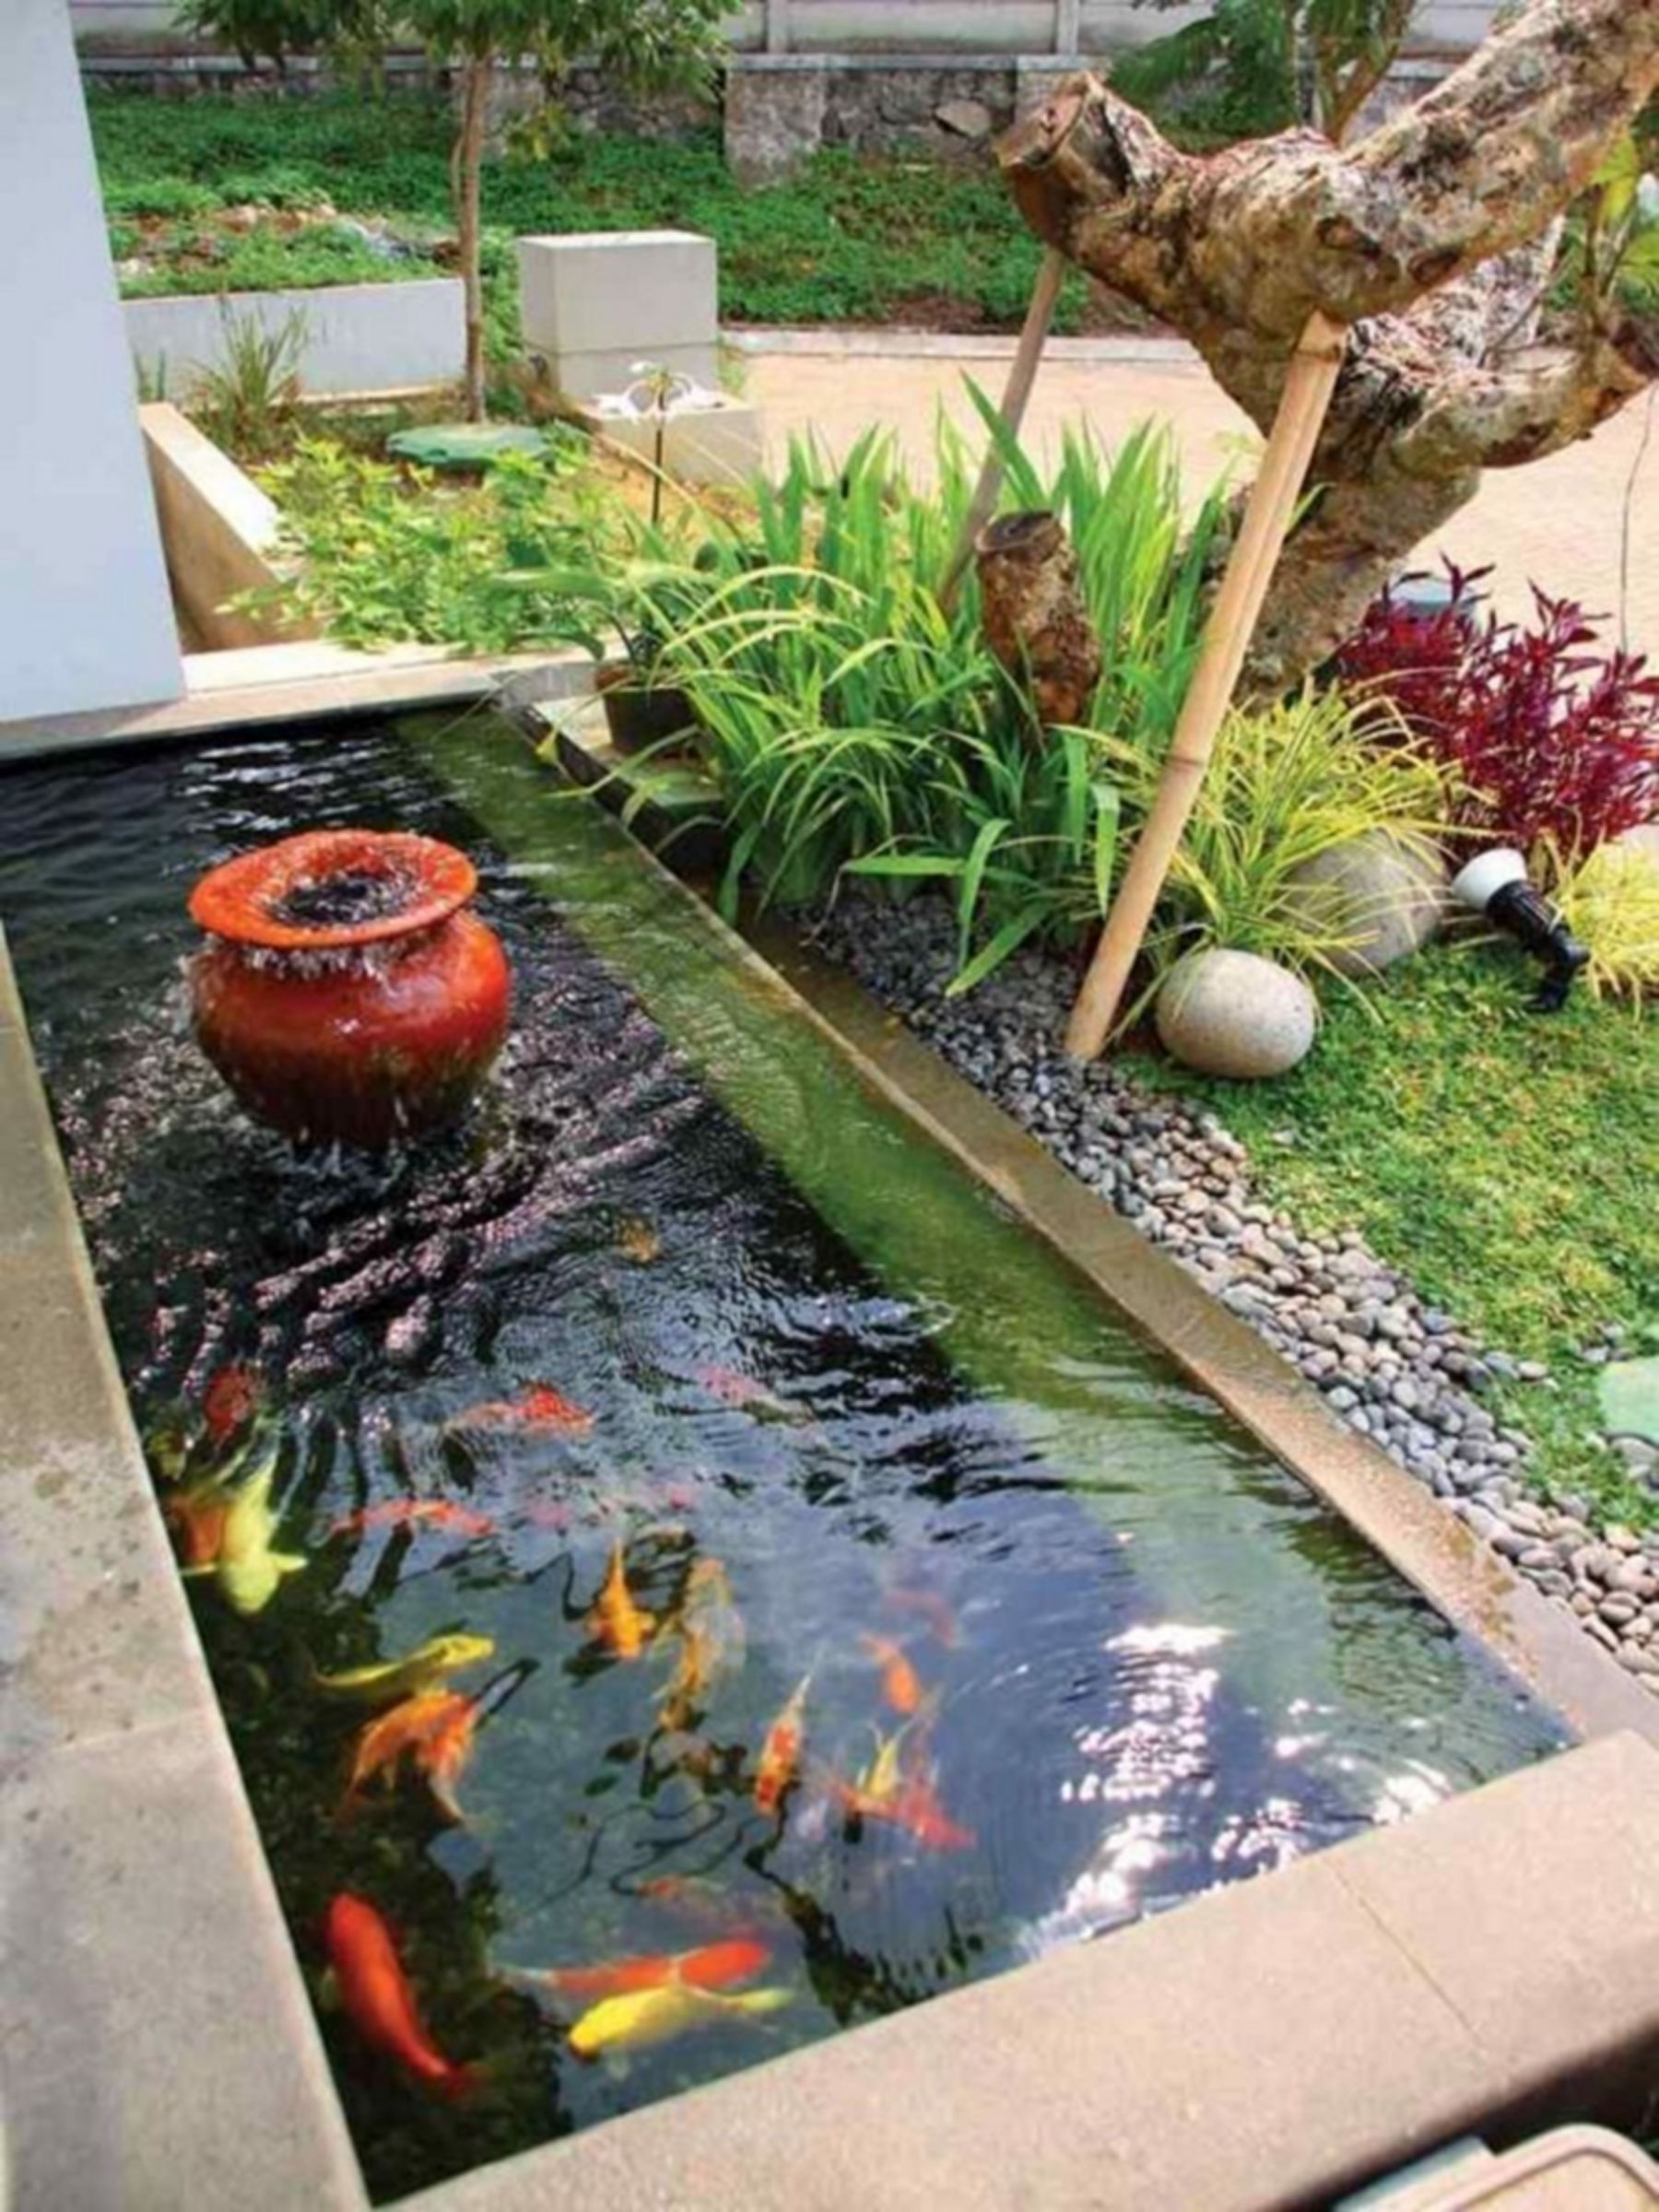 10 Minimalist Fish Pond Design Ideas For Your Home Backyard Beauty Fish Ponds Backyard Fish Pond Gardens Ponds Backyard